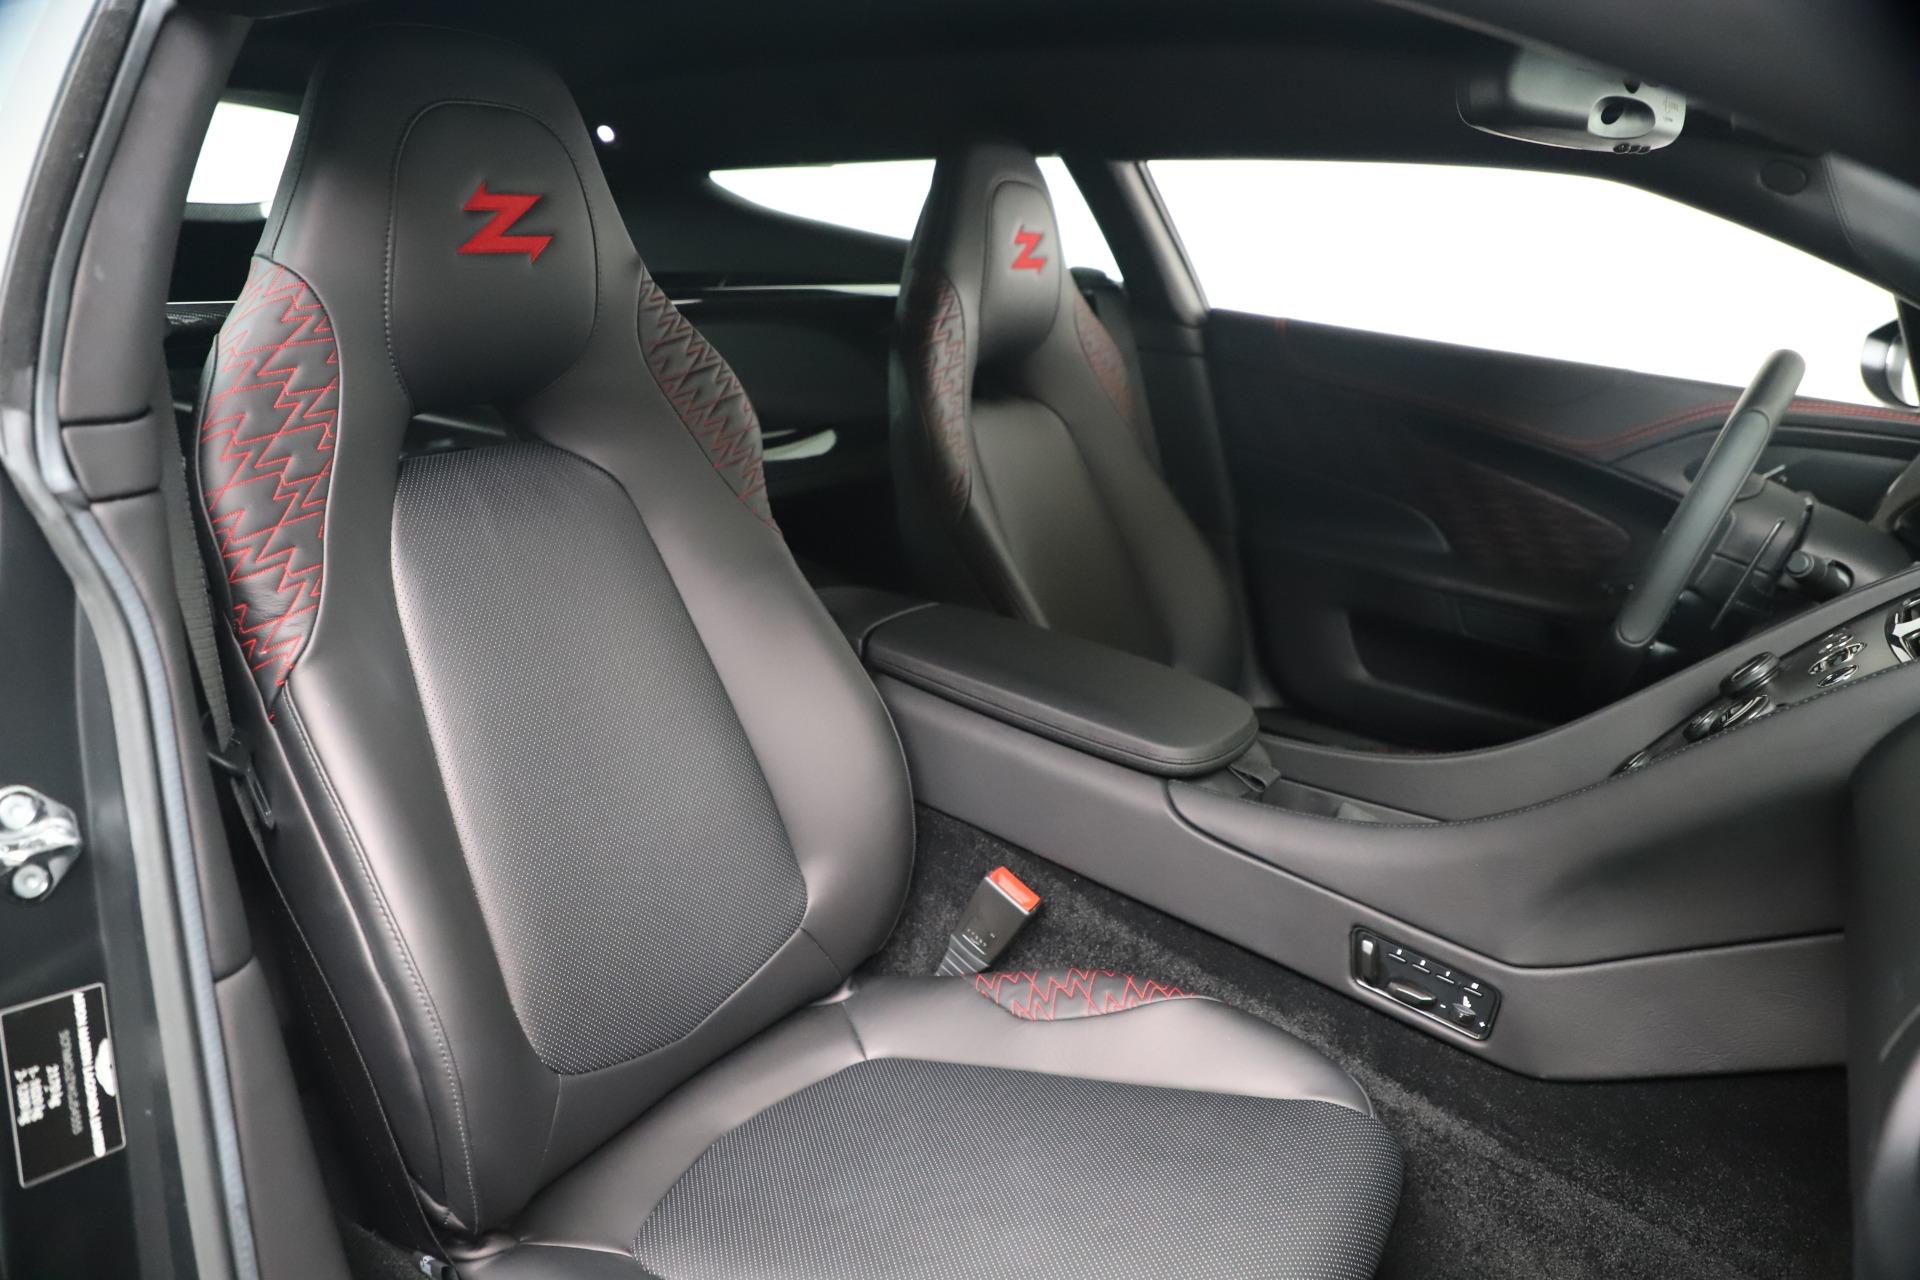 New 2019 Aston Martin Vanquish Shooting Brake For Sale In Westport, CT 3512_p20